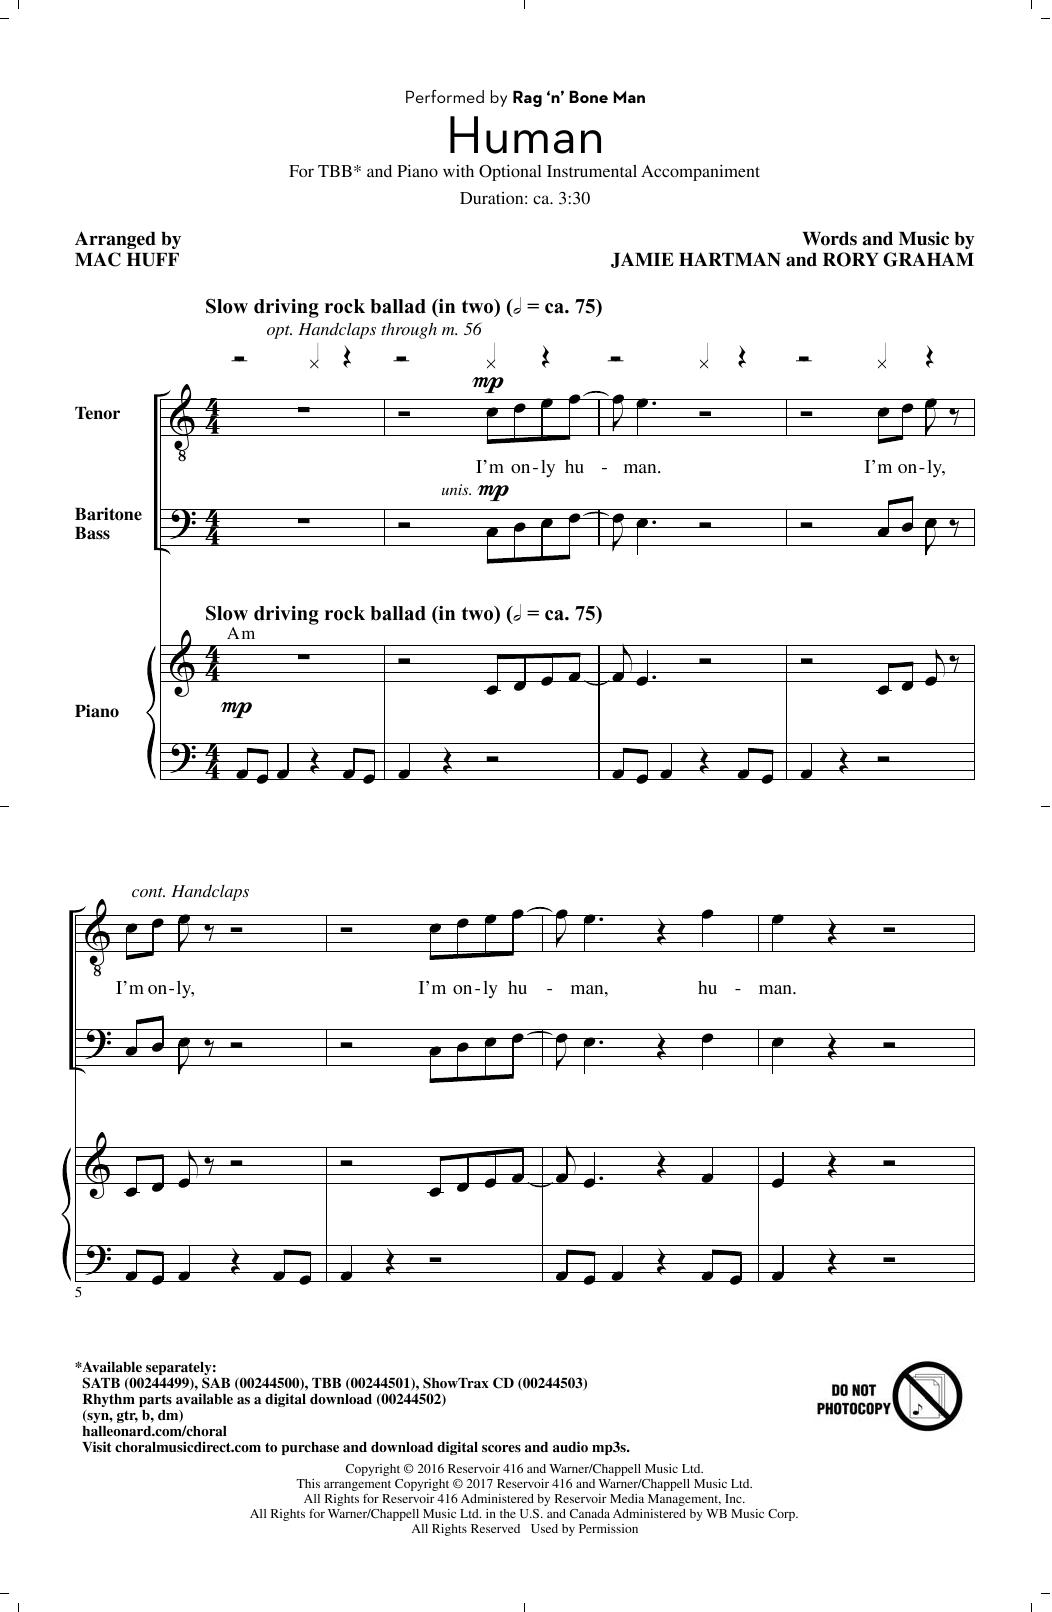 Rag'n'Bone Man Human (arr. Mac Huff) sheet music notes and chords. Download Printable PDF.